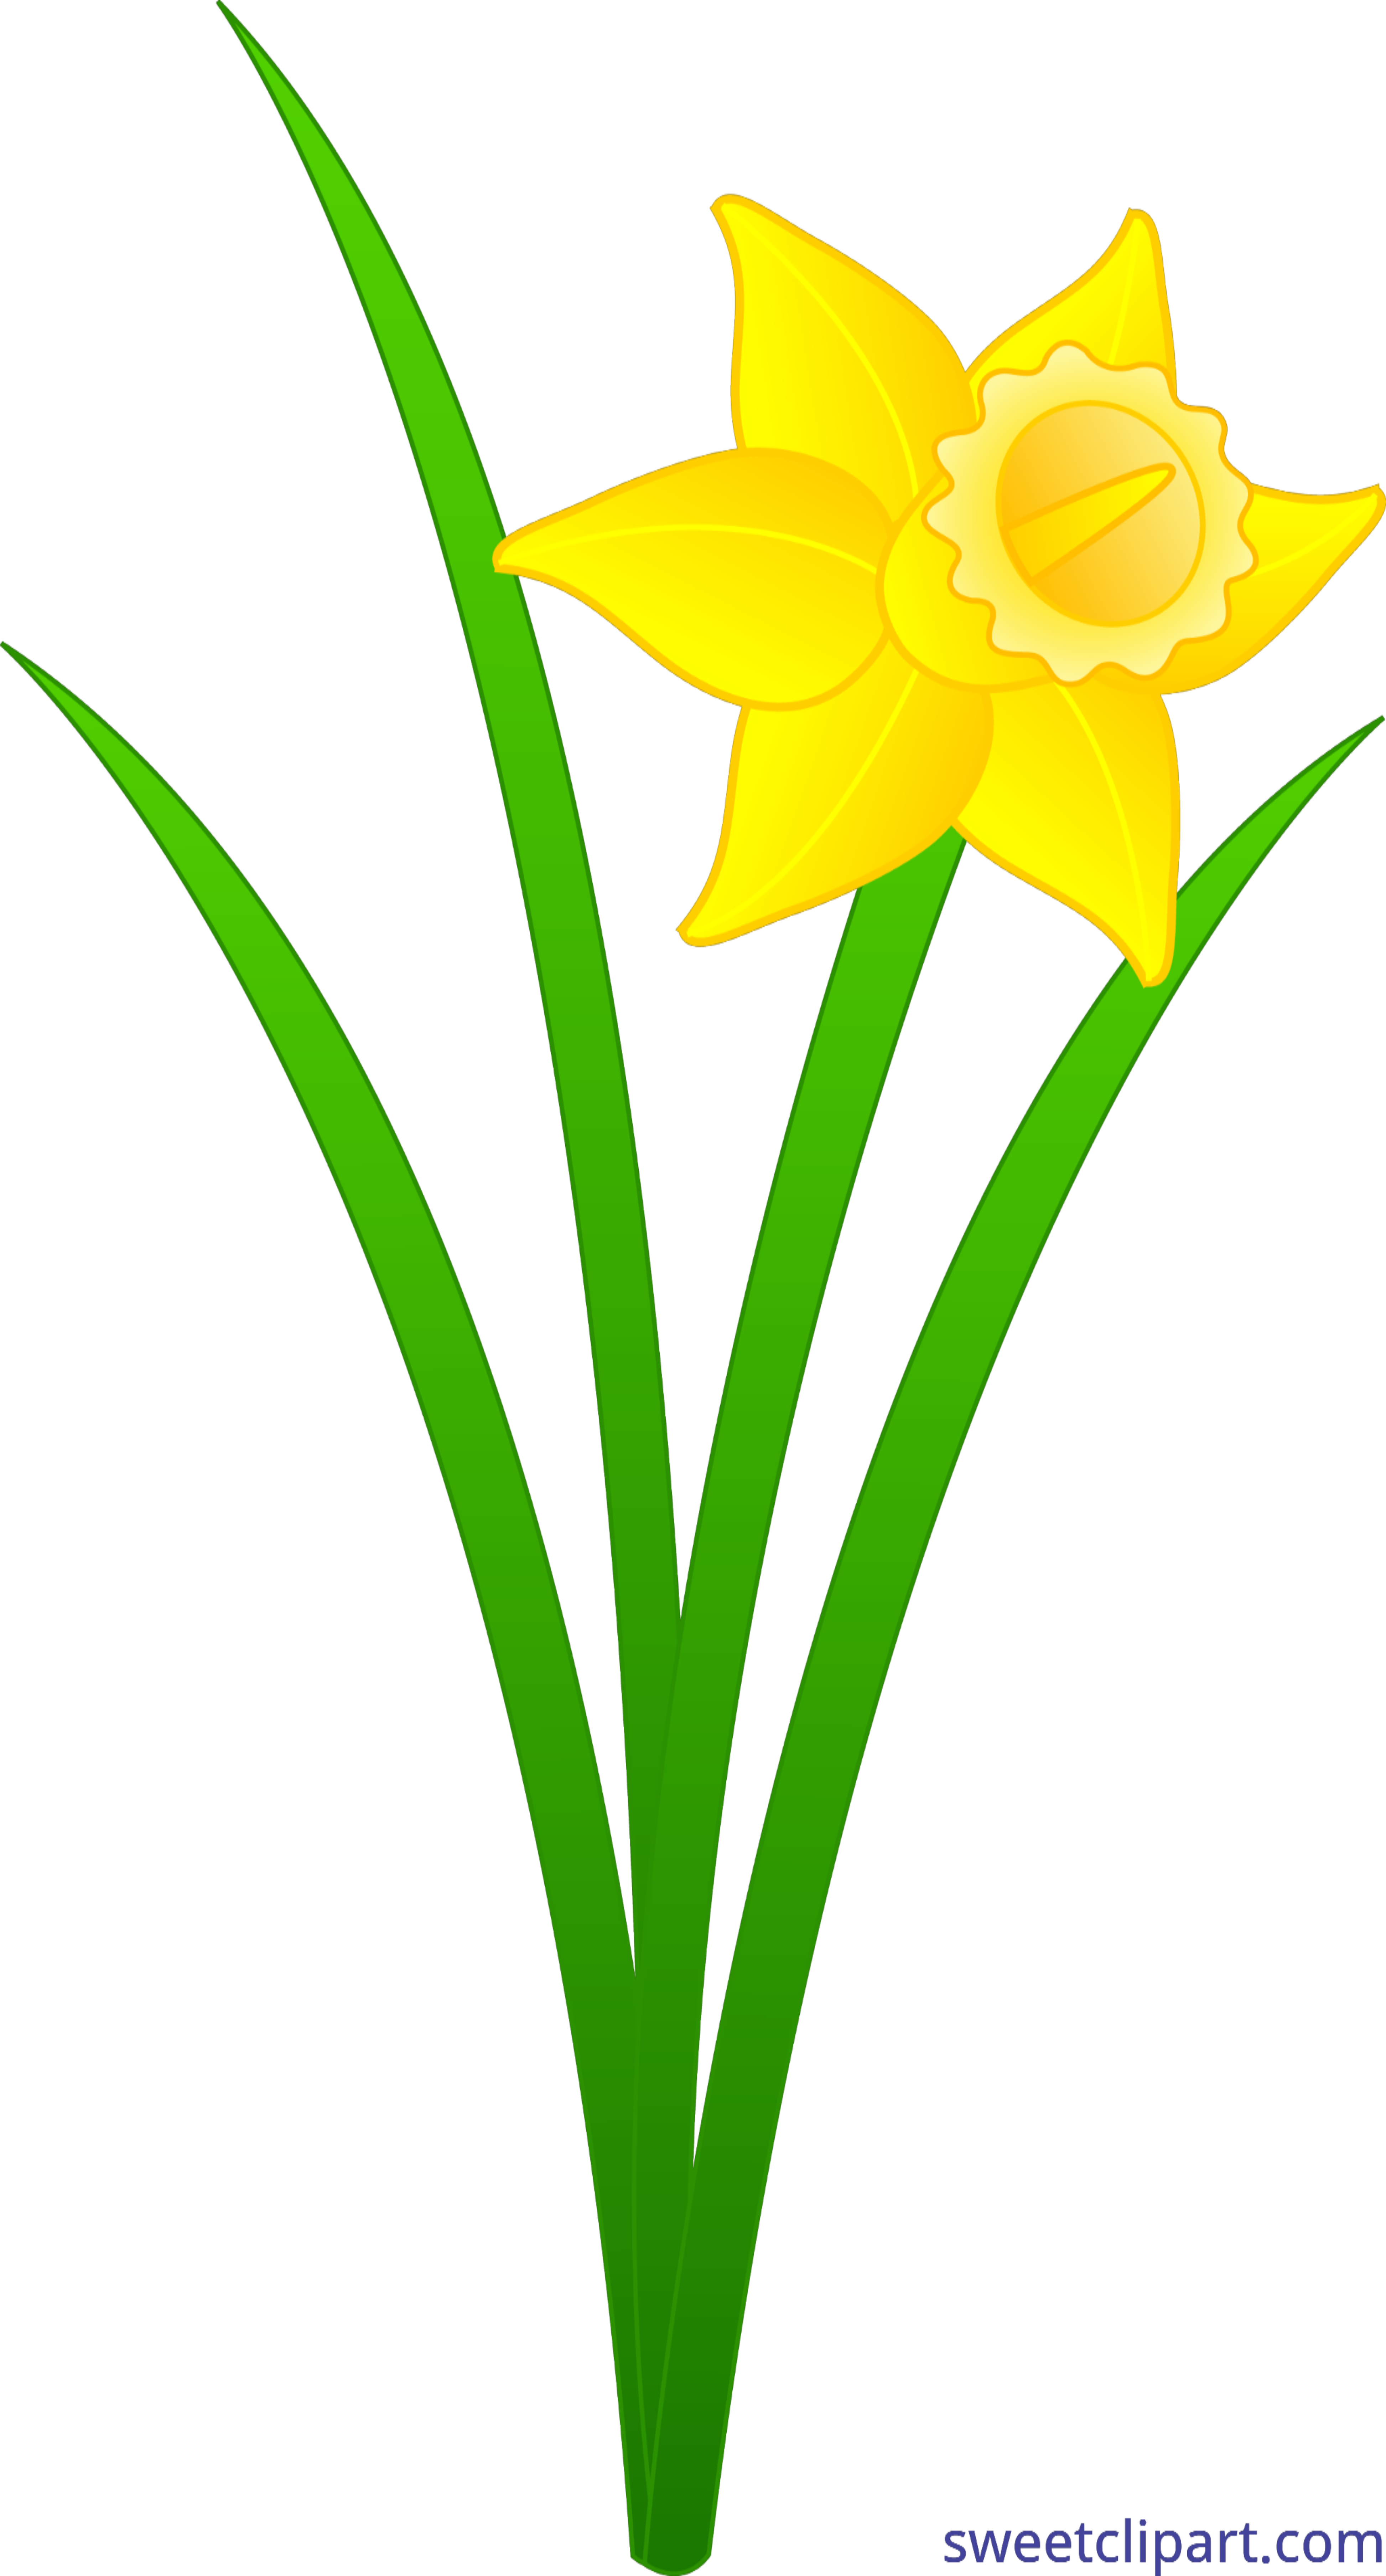 jpg transparent library Daffodil clipart. Golden clip art sweet.